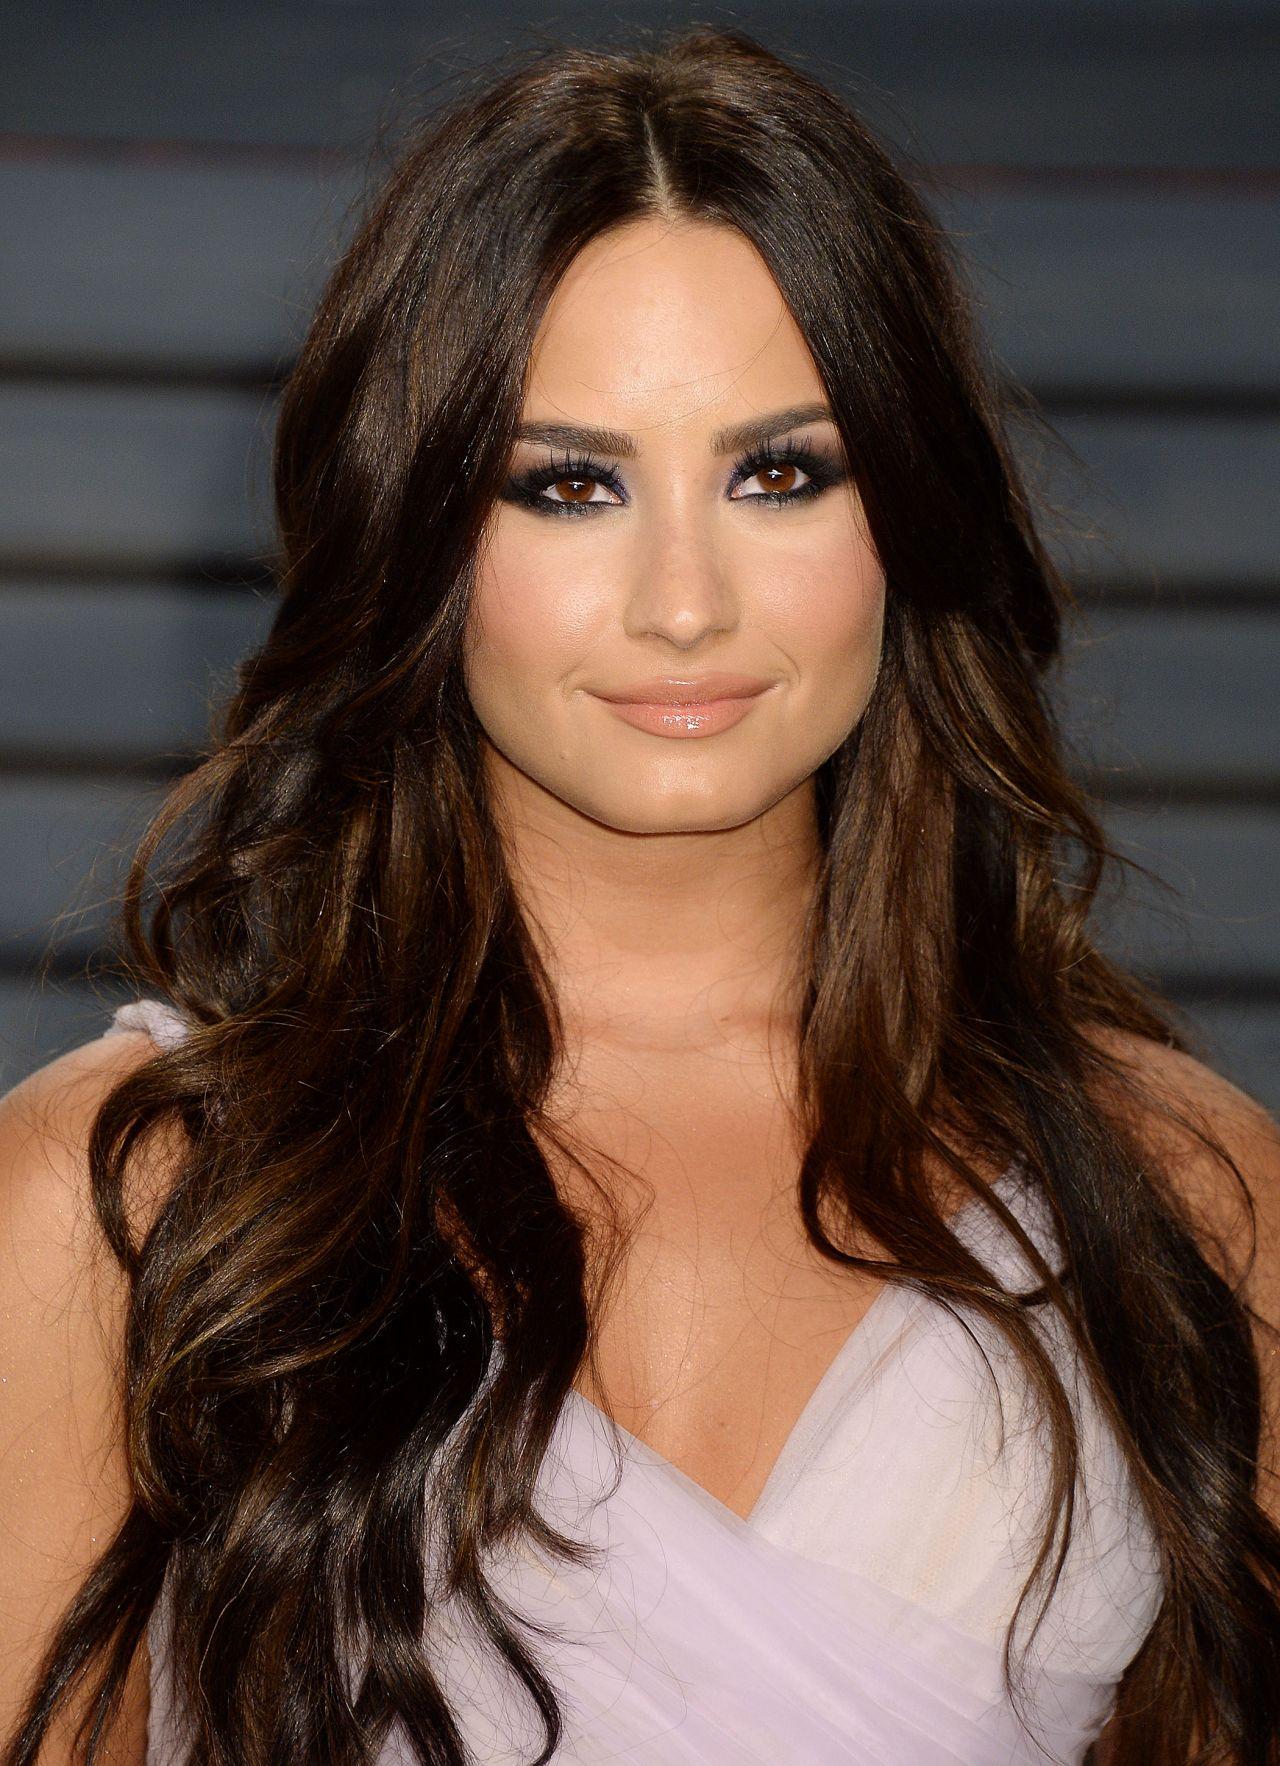 Demi Lovato At Vanity Fair Oscar 2017 Party In Los Angeles-2445